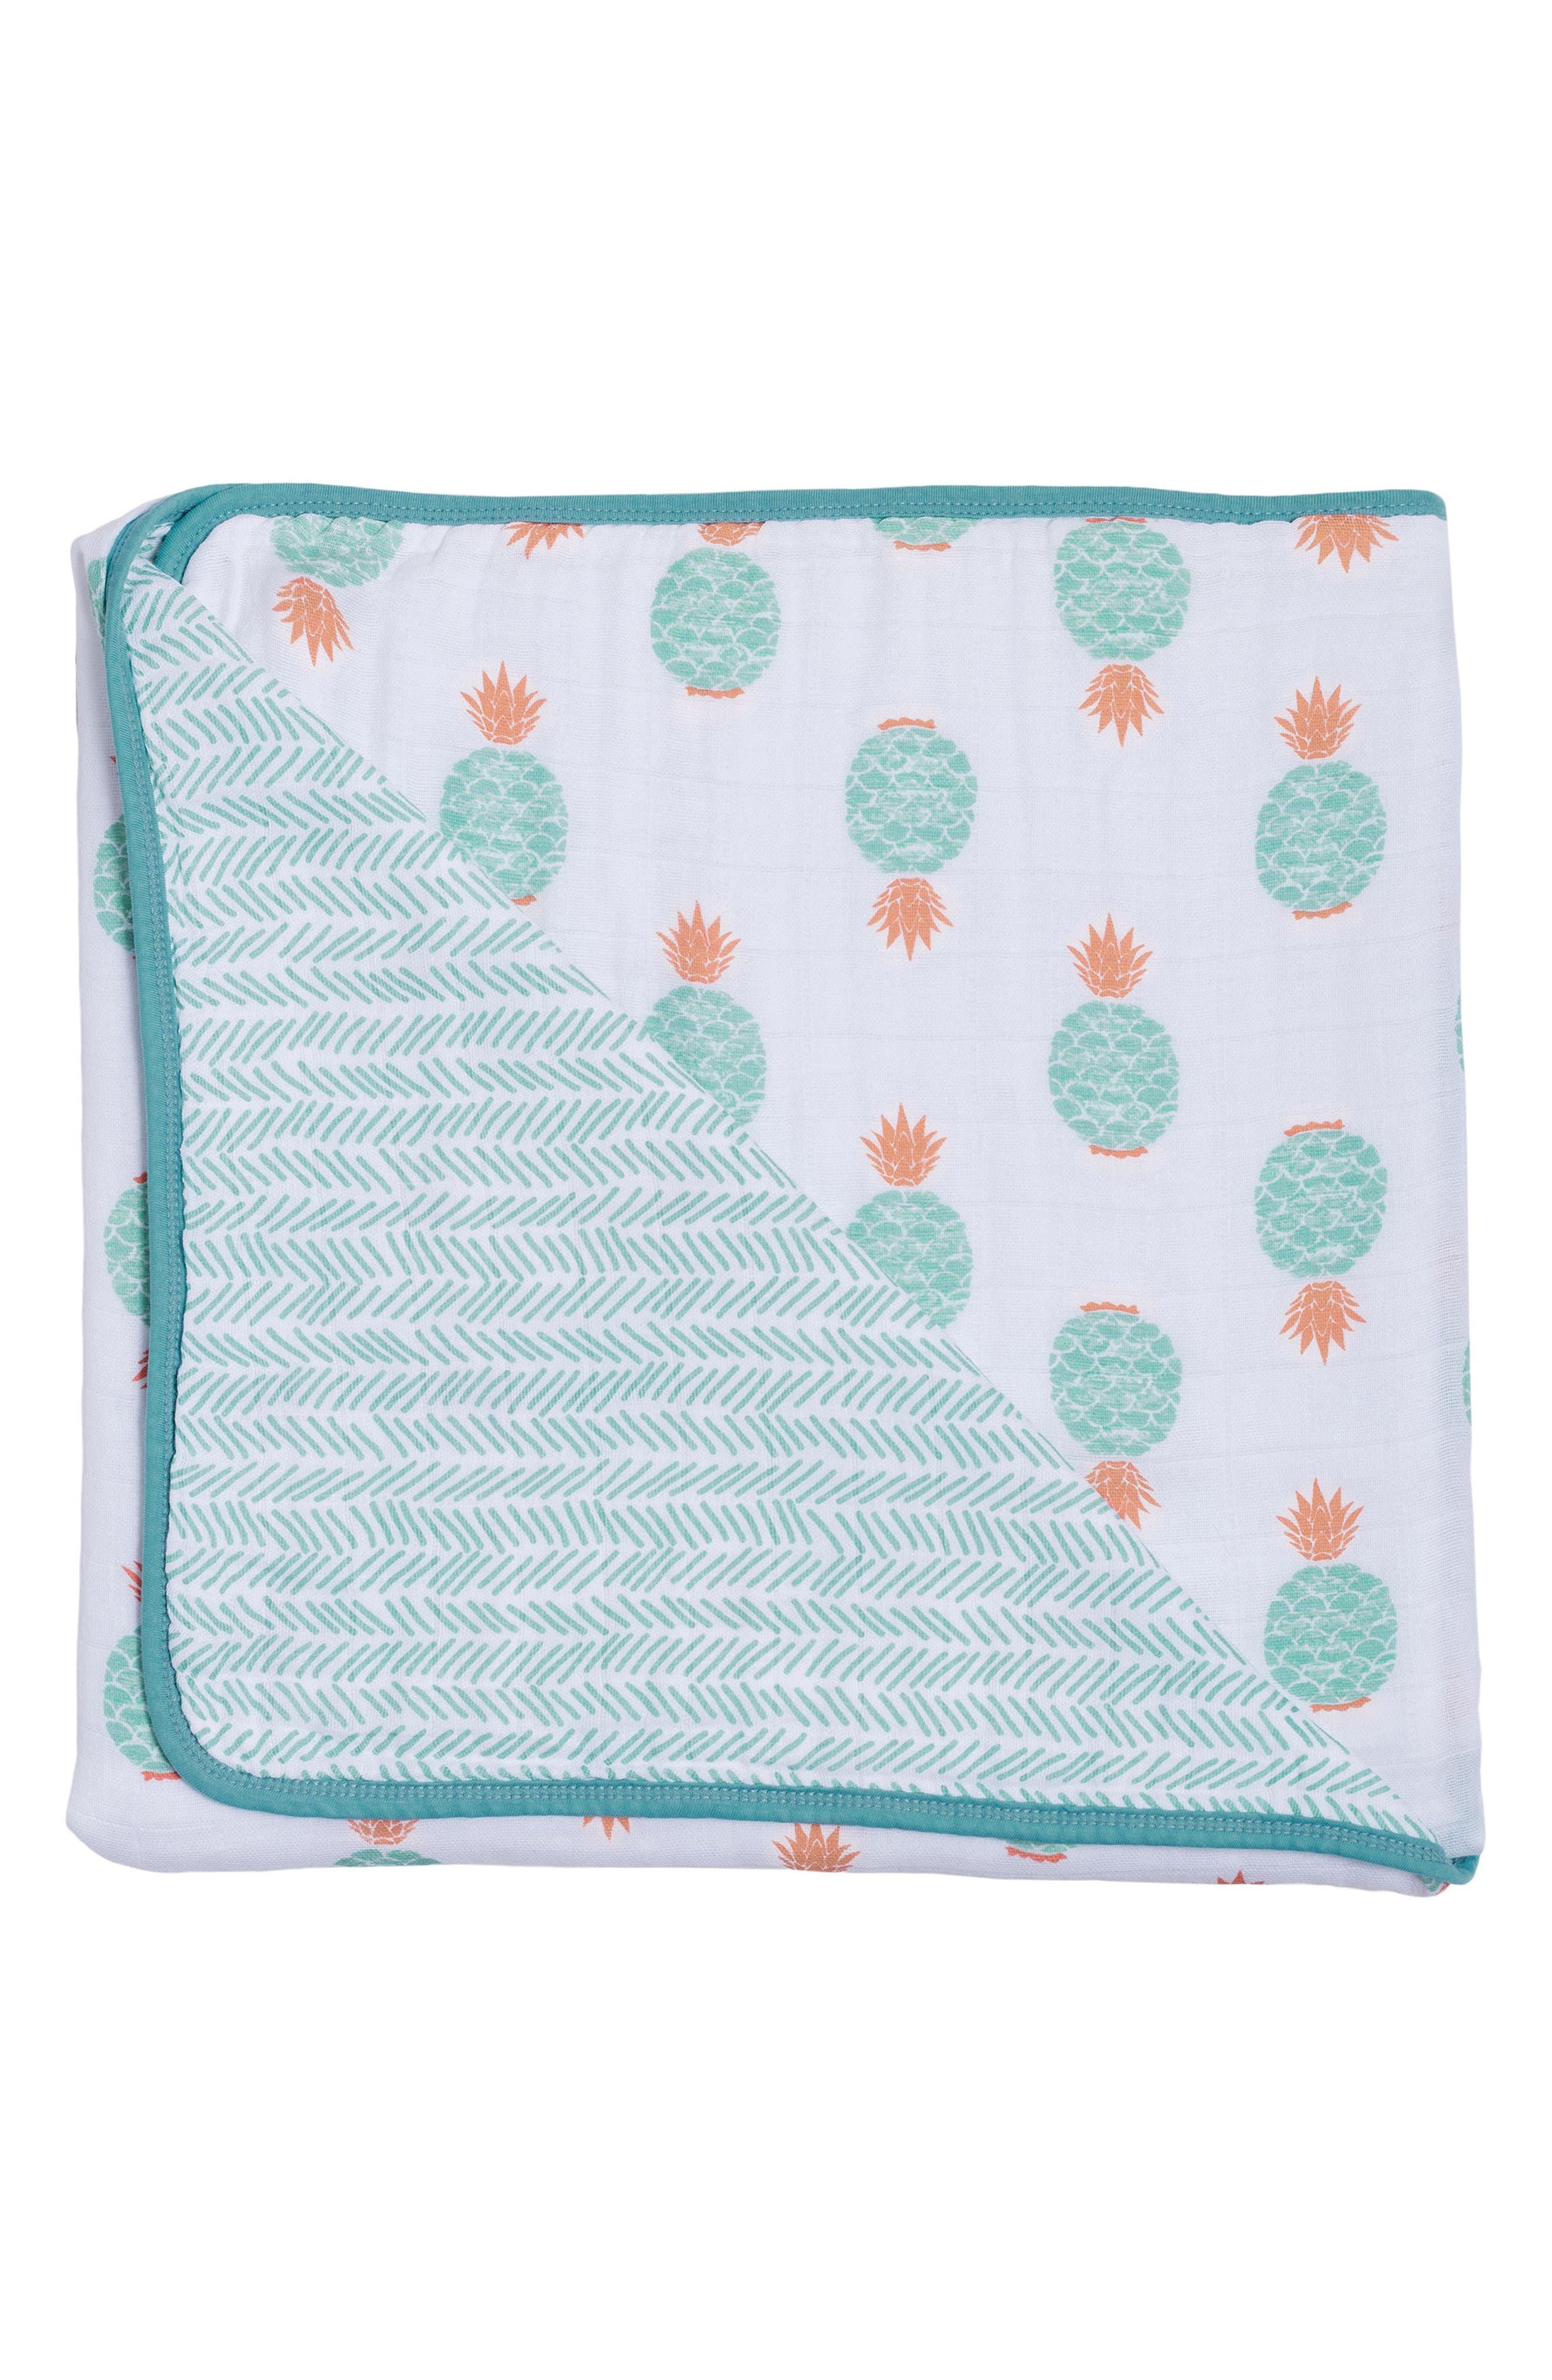 Cotton Muslin Blanket,                             Main thumbnail 1, color,                             340